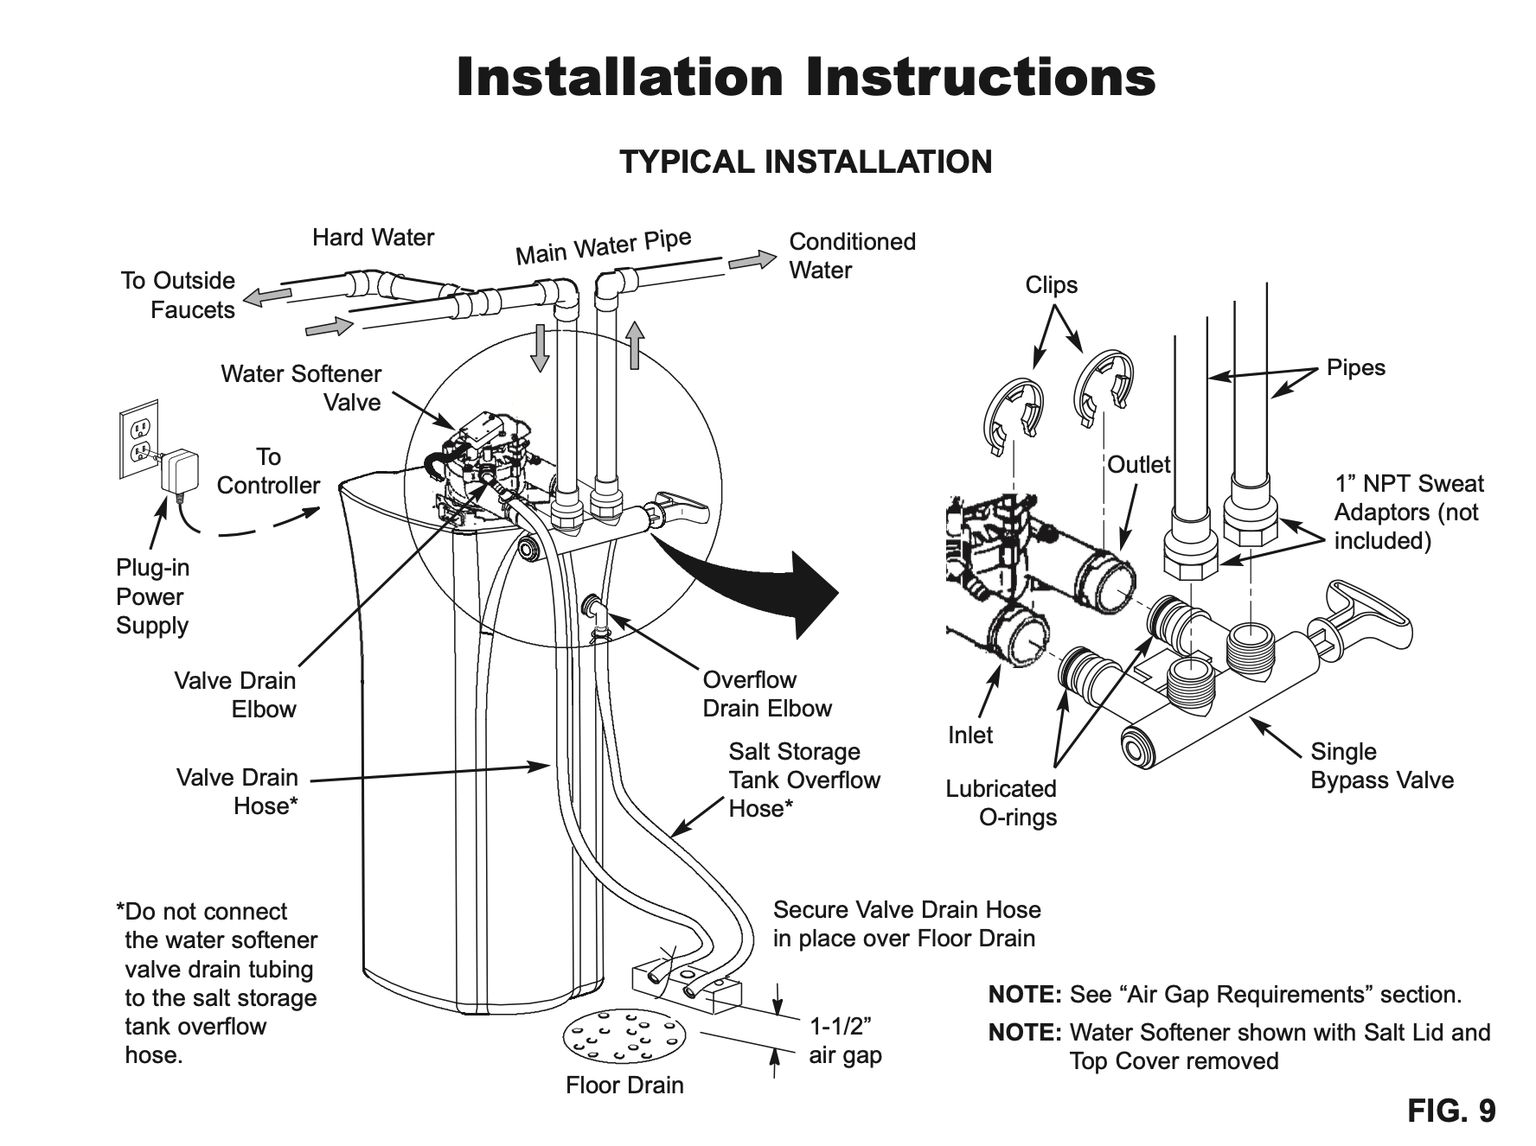 Water Softener Bypass Valve Operation & Repair Guide | Whirlpool Water Softener Wiring Diagram |  | InspectAPedia.com